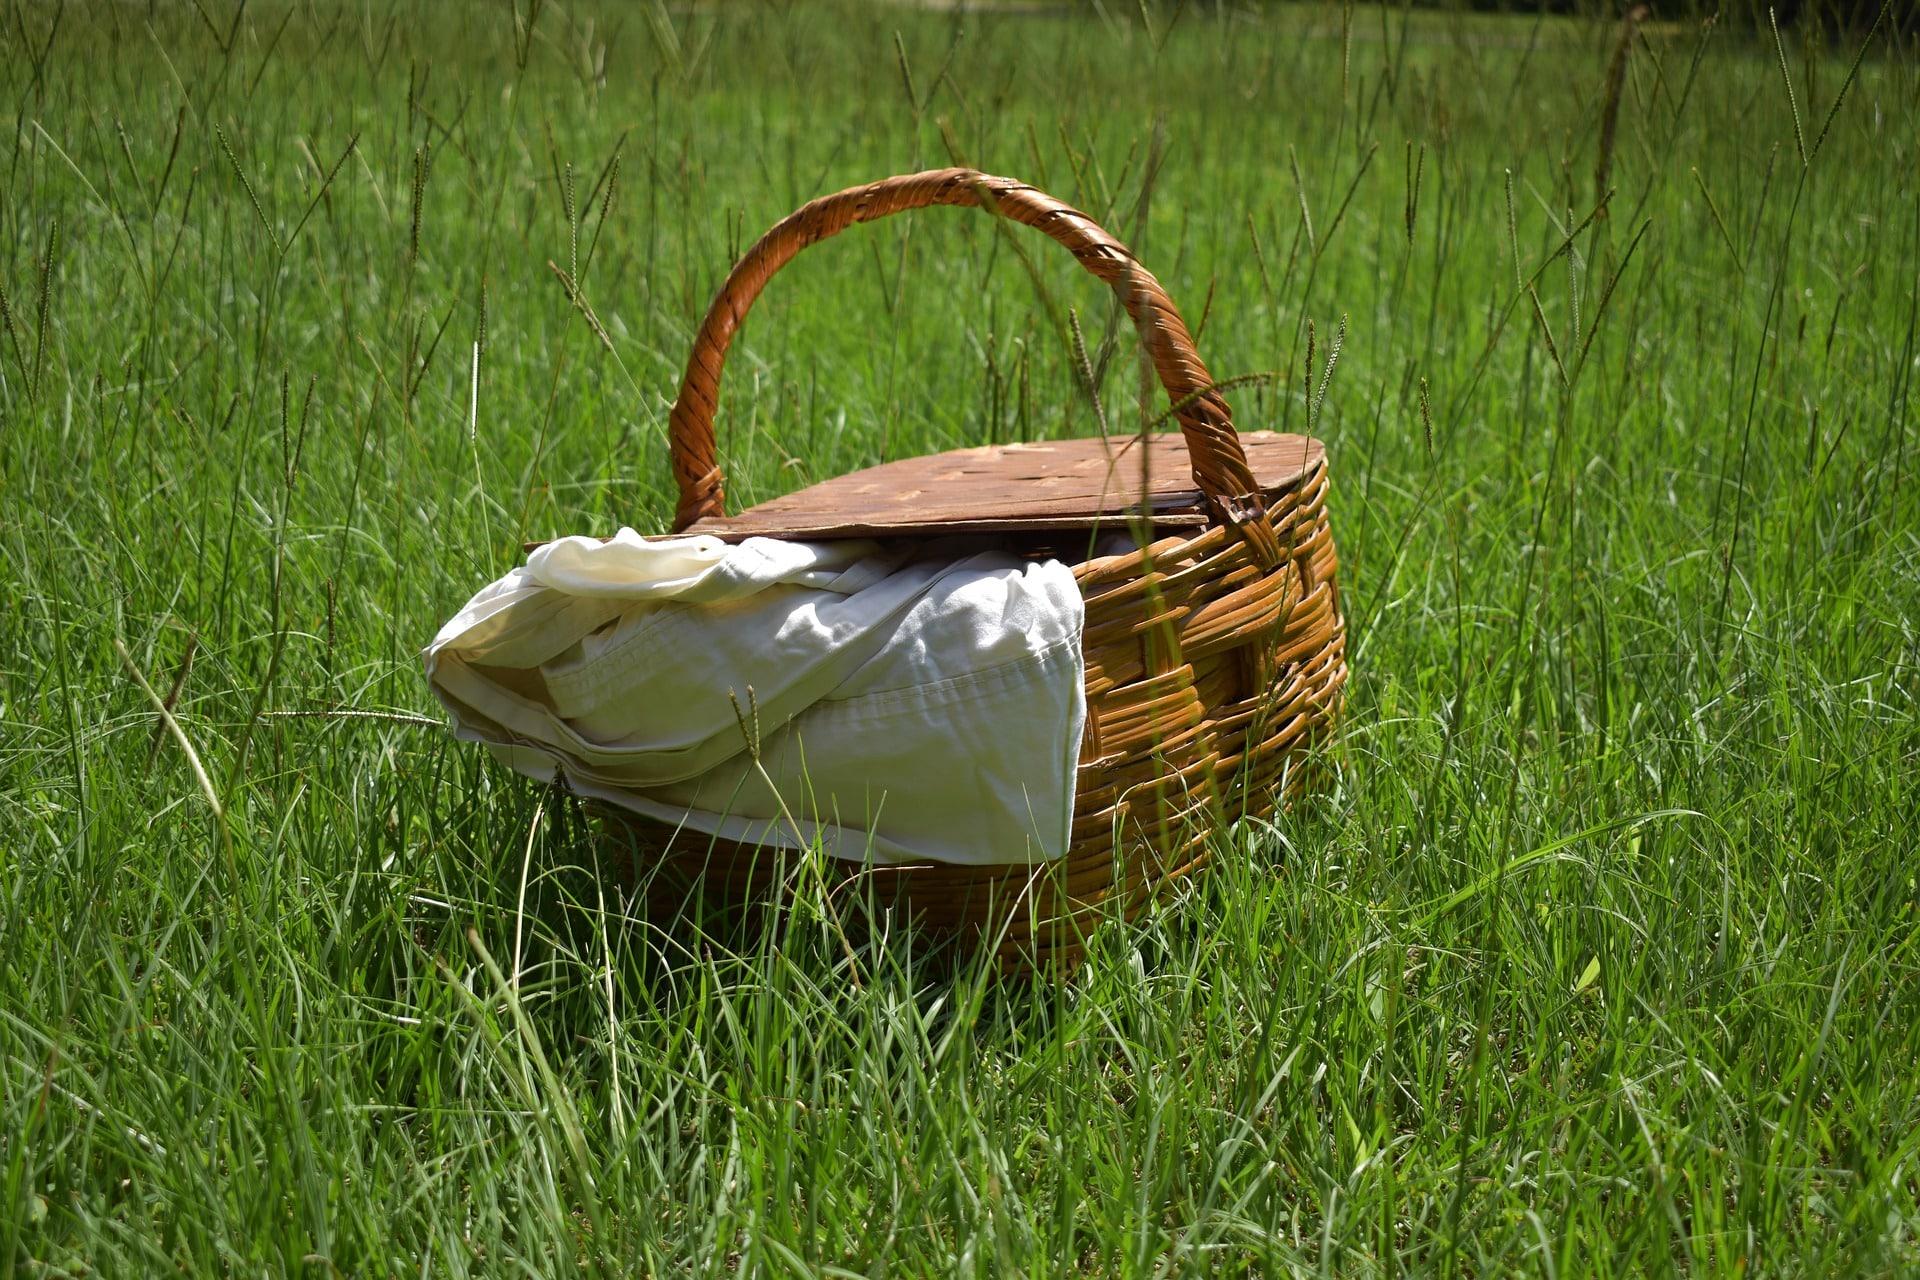 panier repas sur l'herbe